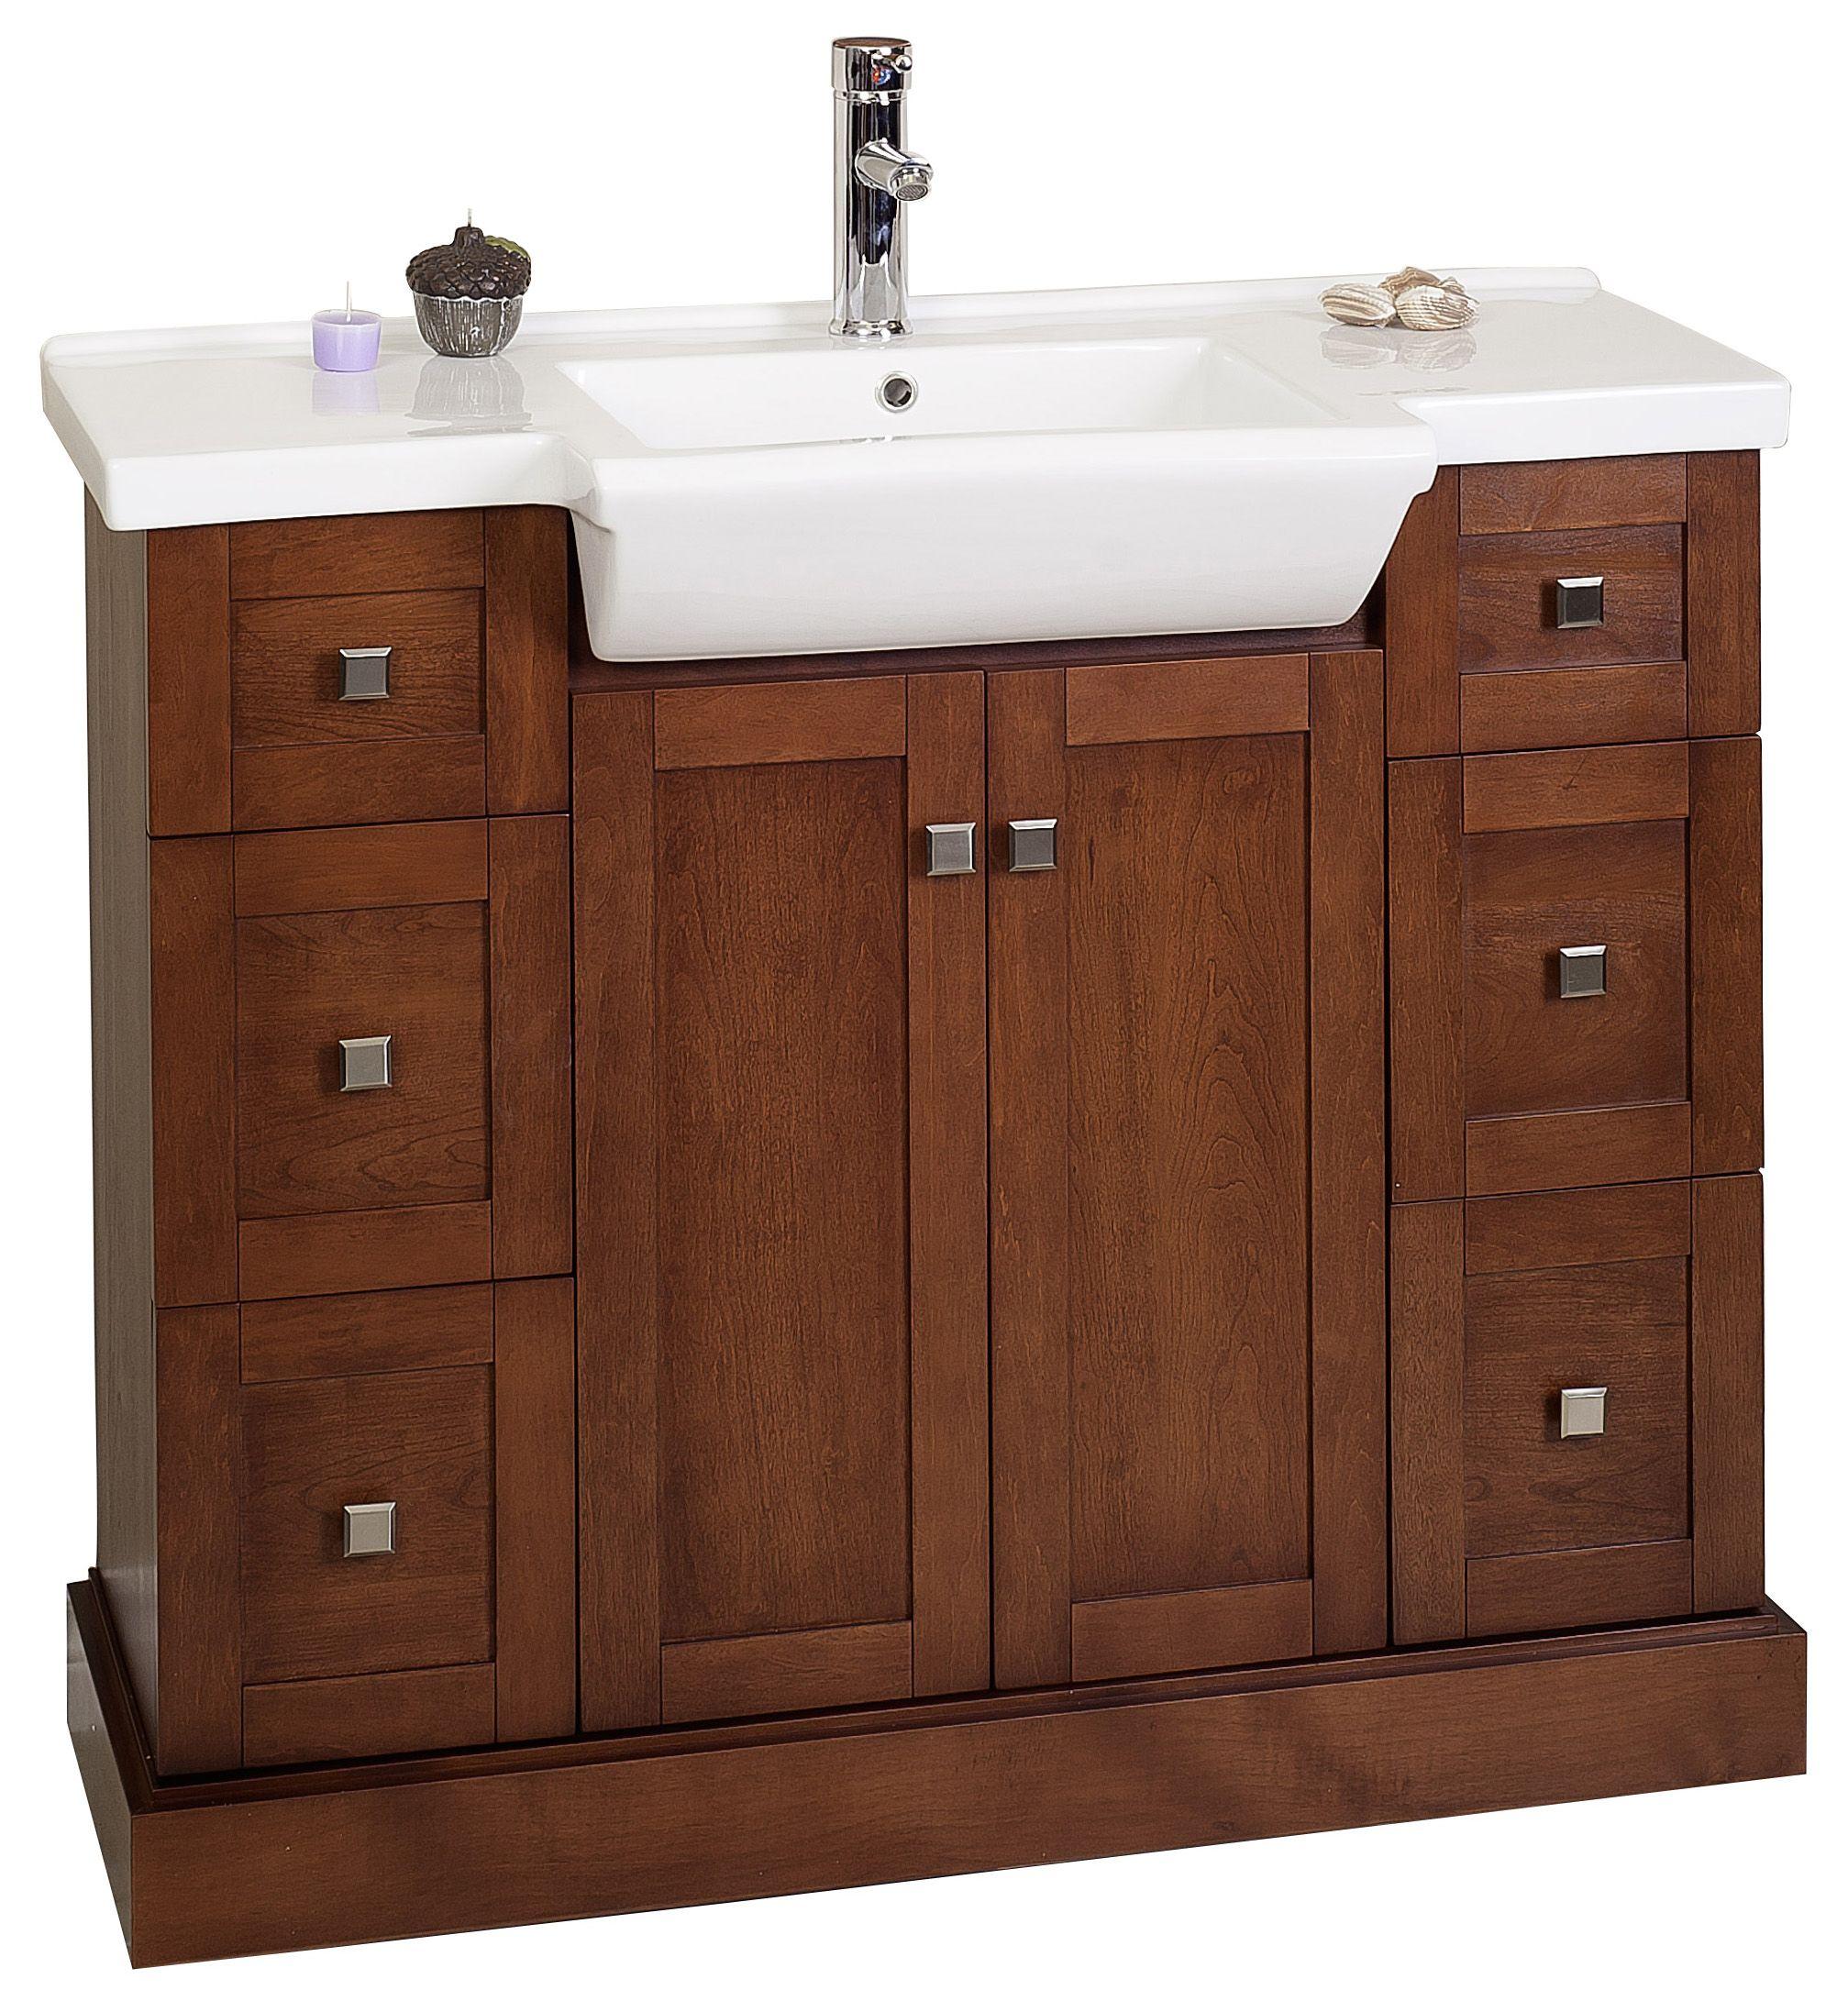 Amimage 40 Inch Single Sink Bathroom Vanity Cherry Finish Fascinating 40 Inch Bathroom Vanity 2018